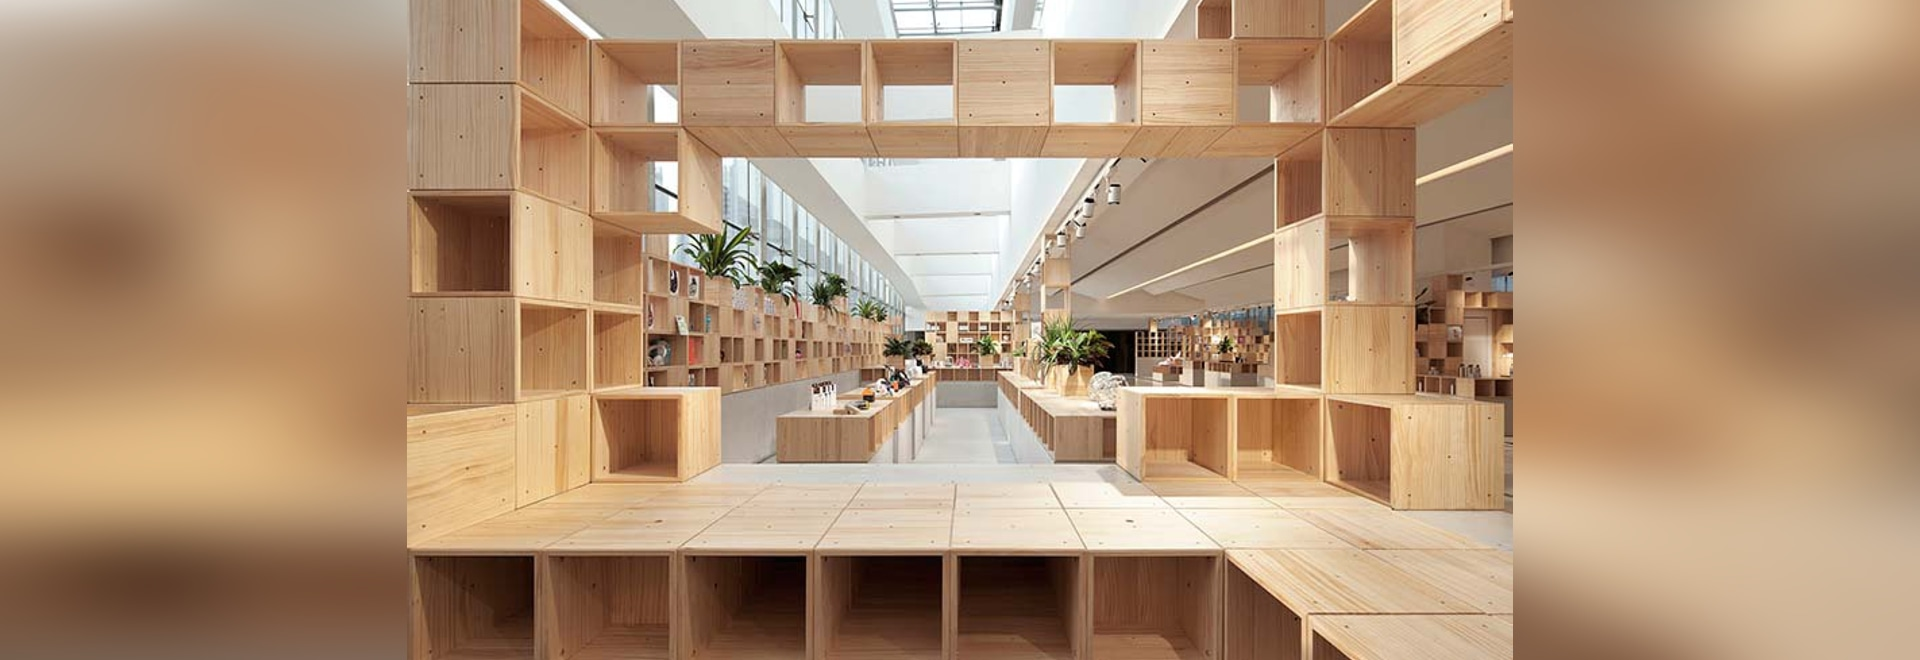 penda develops pixelated wooden interior for chinese tech store - Pixelated Interior Design